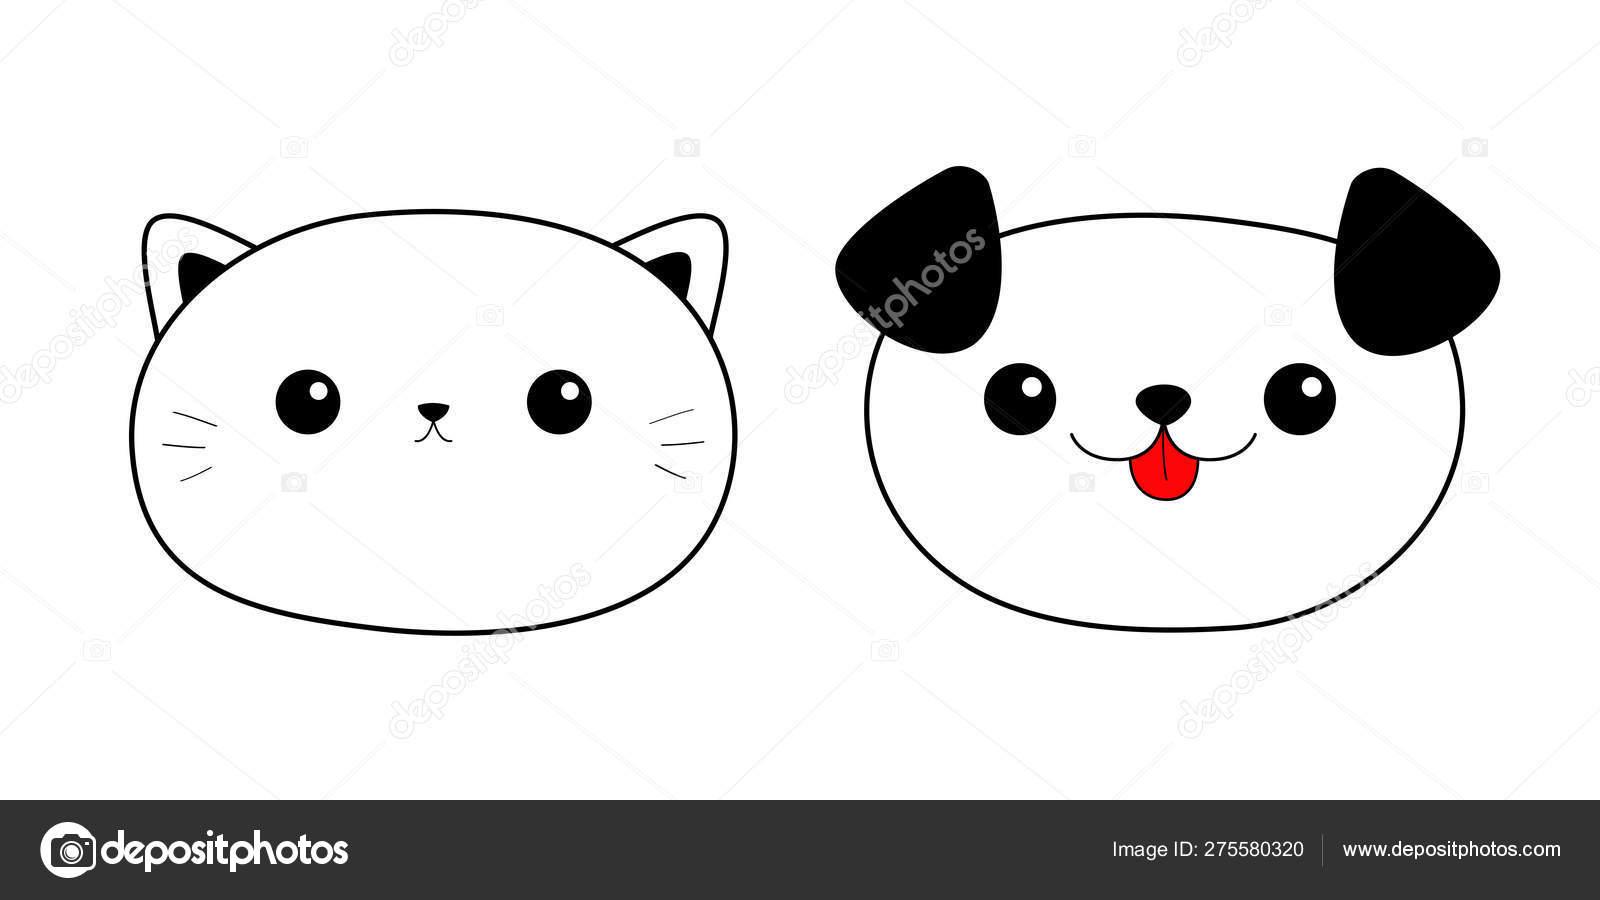 Cat Dog Head Face Linear Silhouette Icon Set Contour Line